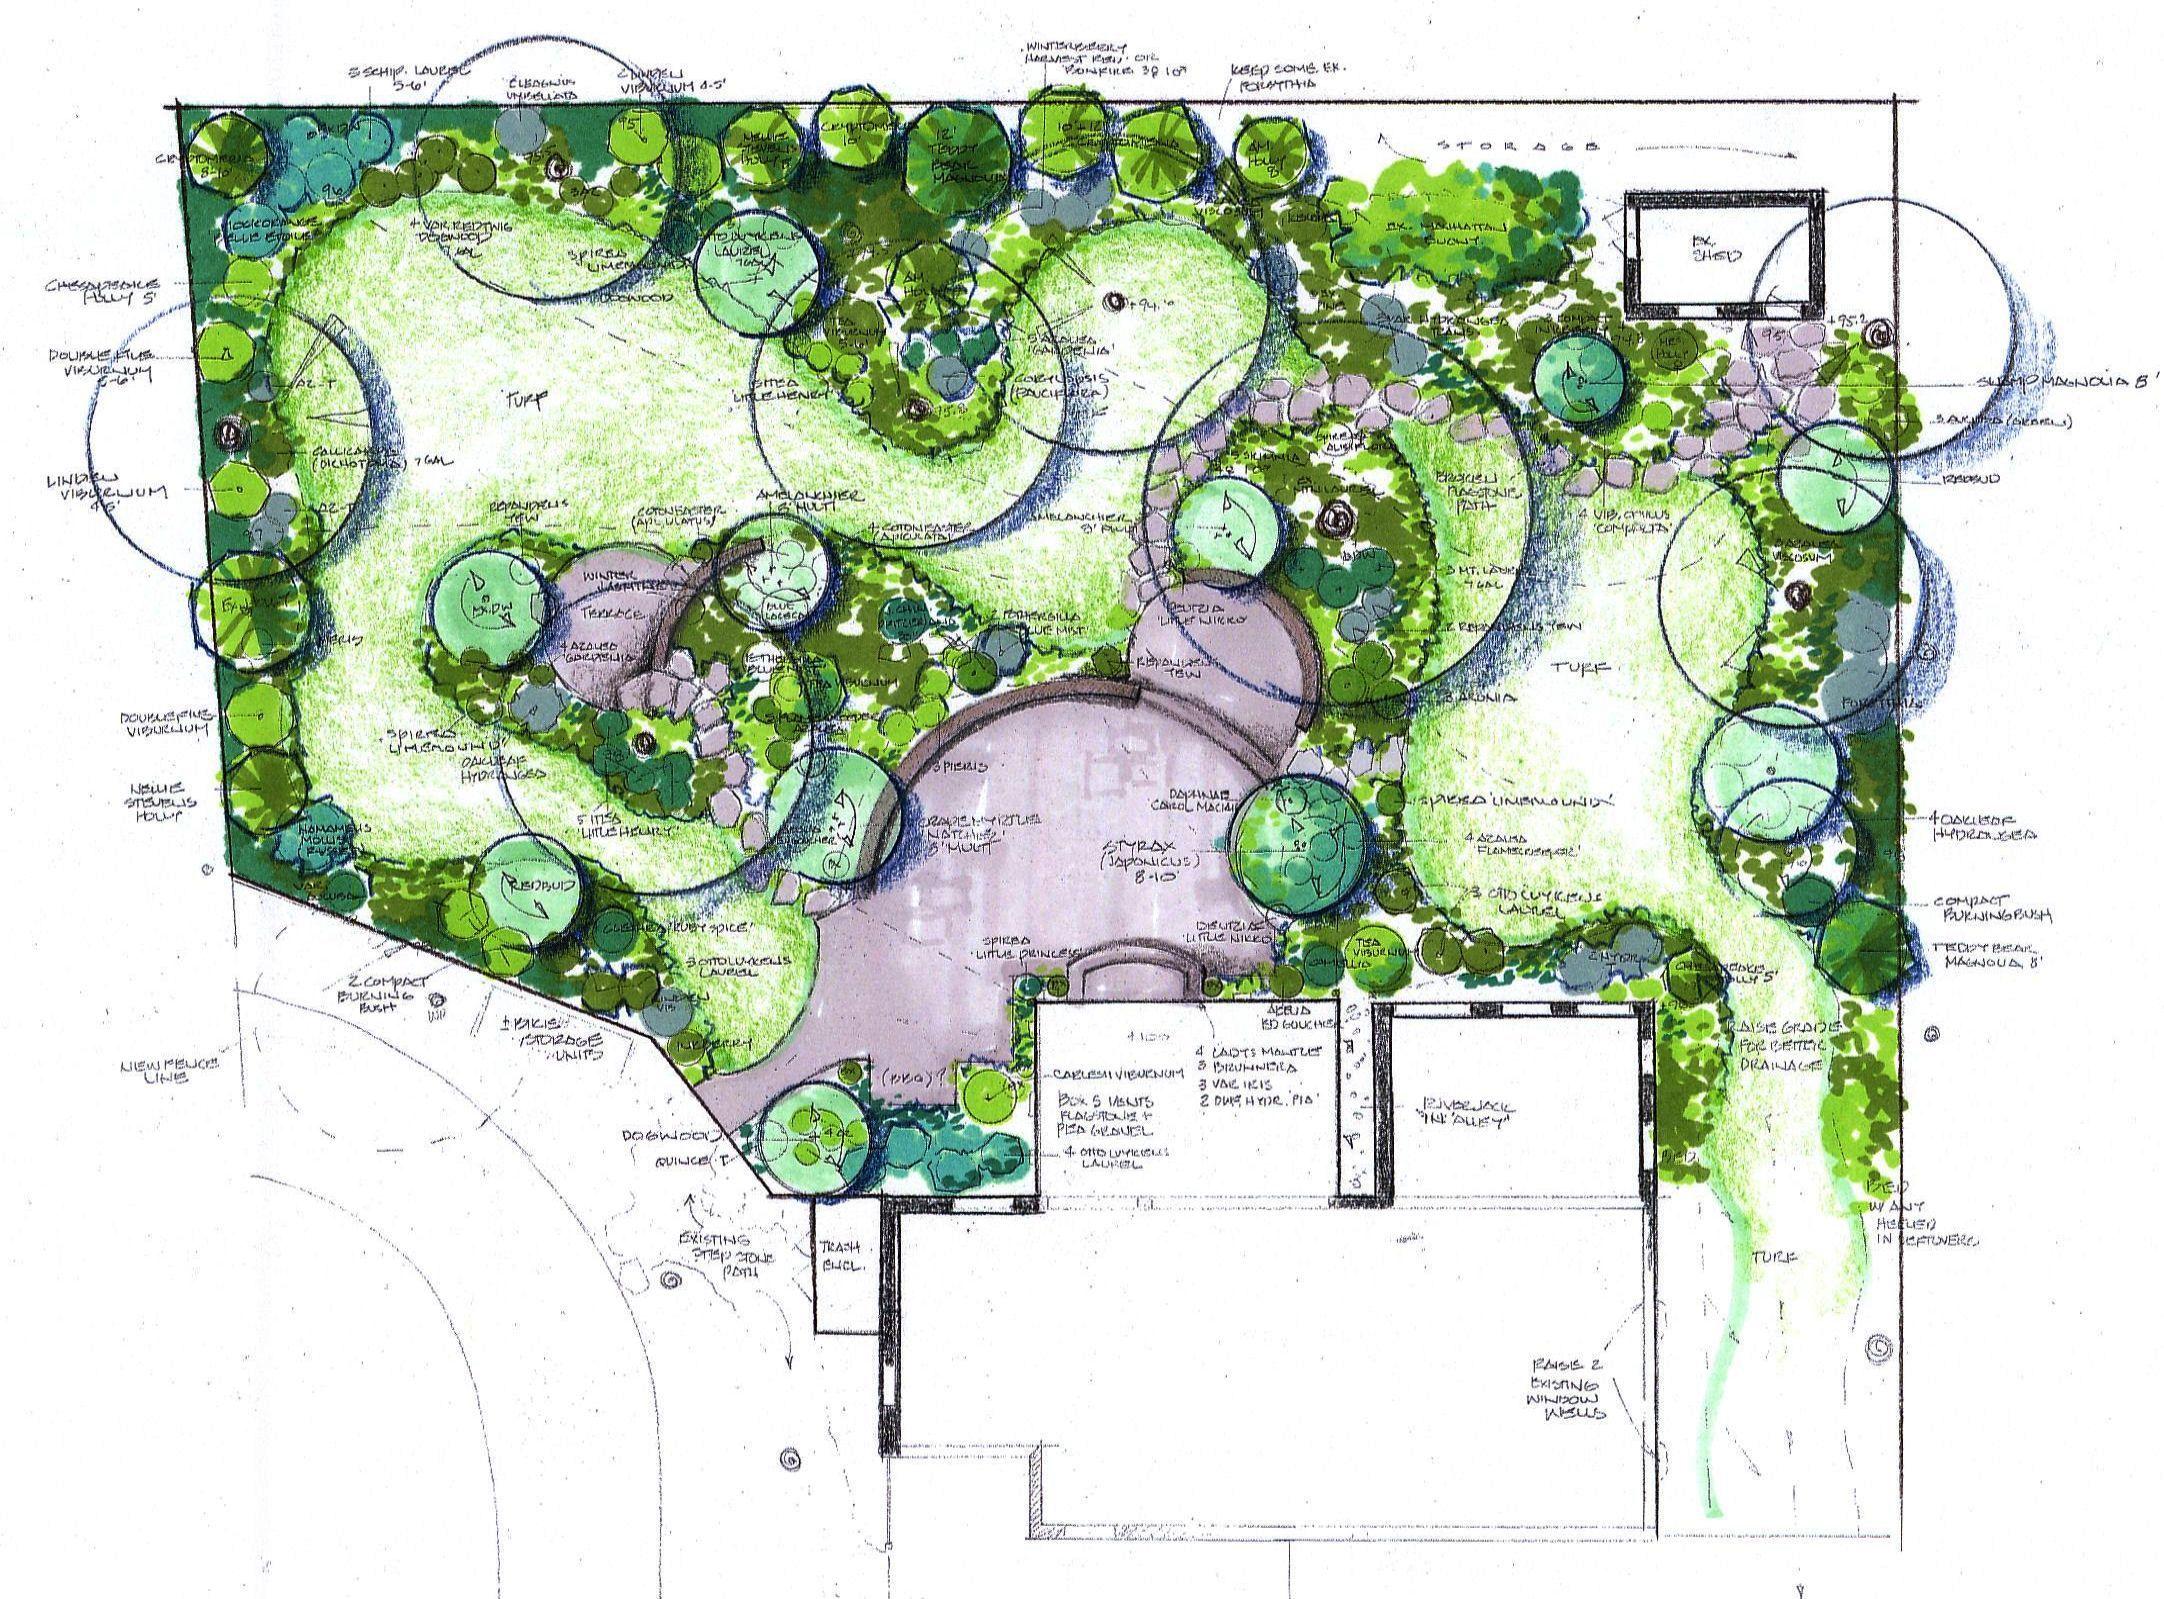 Terrific Landscape Design Online Degree Great Landscape Design Drawings Landscape Design Program Free Landscape Design